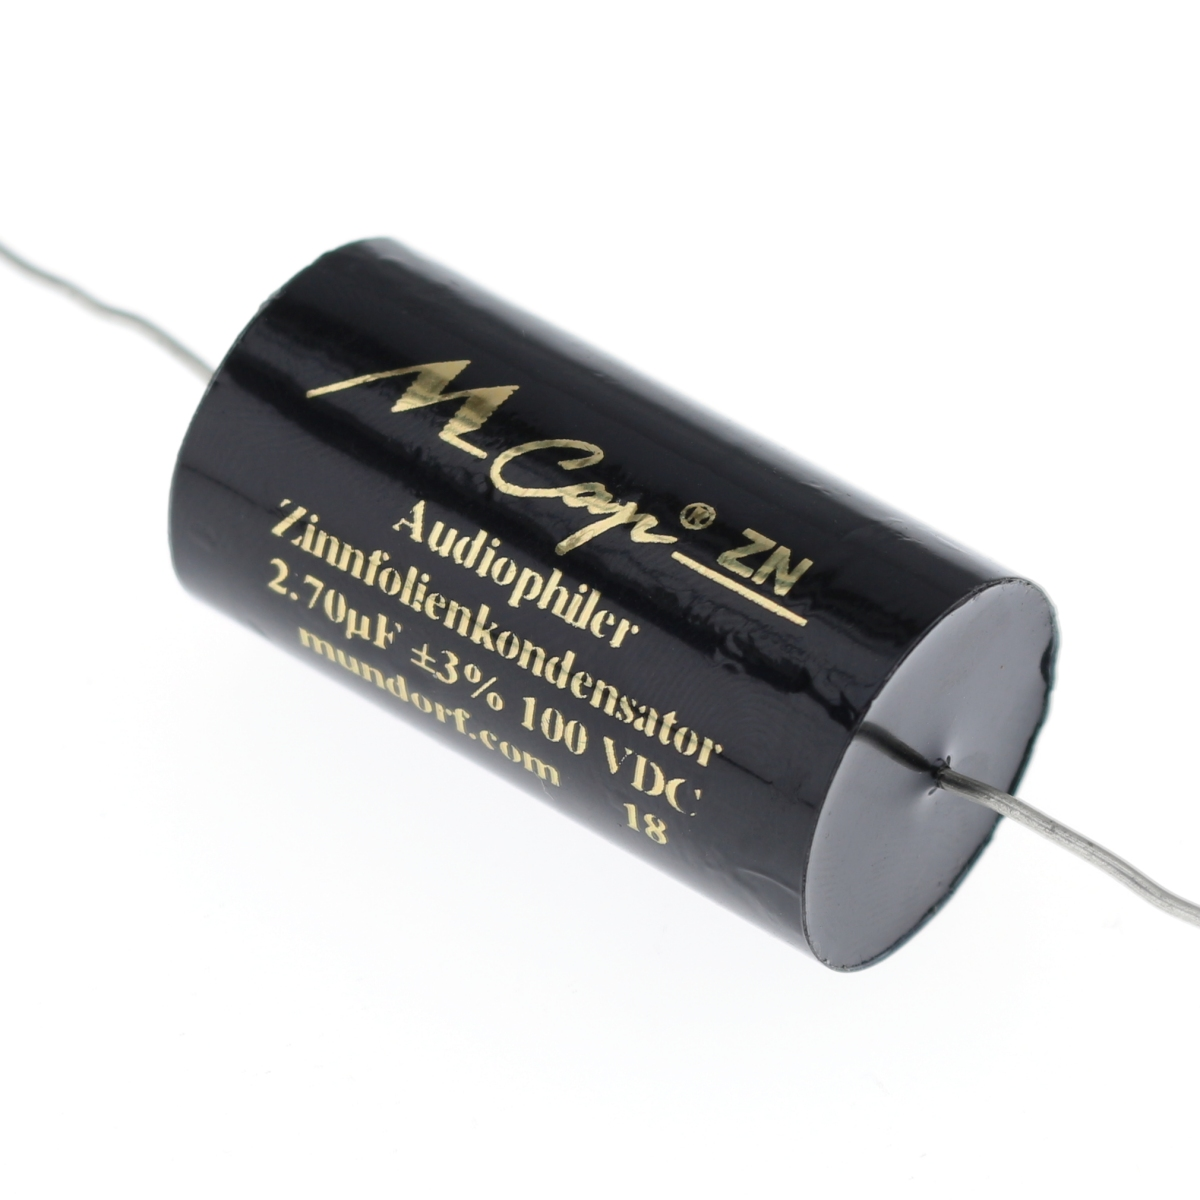 MUNDORF MCAP ZN Capacitor 250V 1.5μF